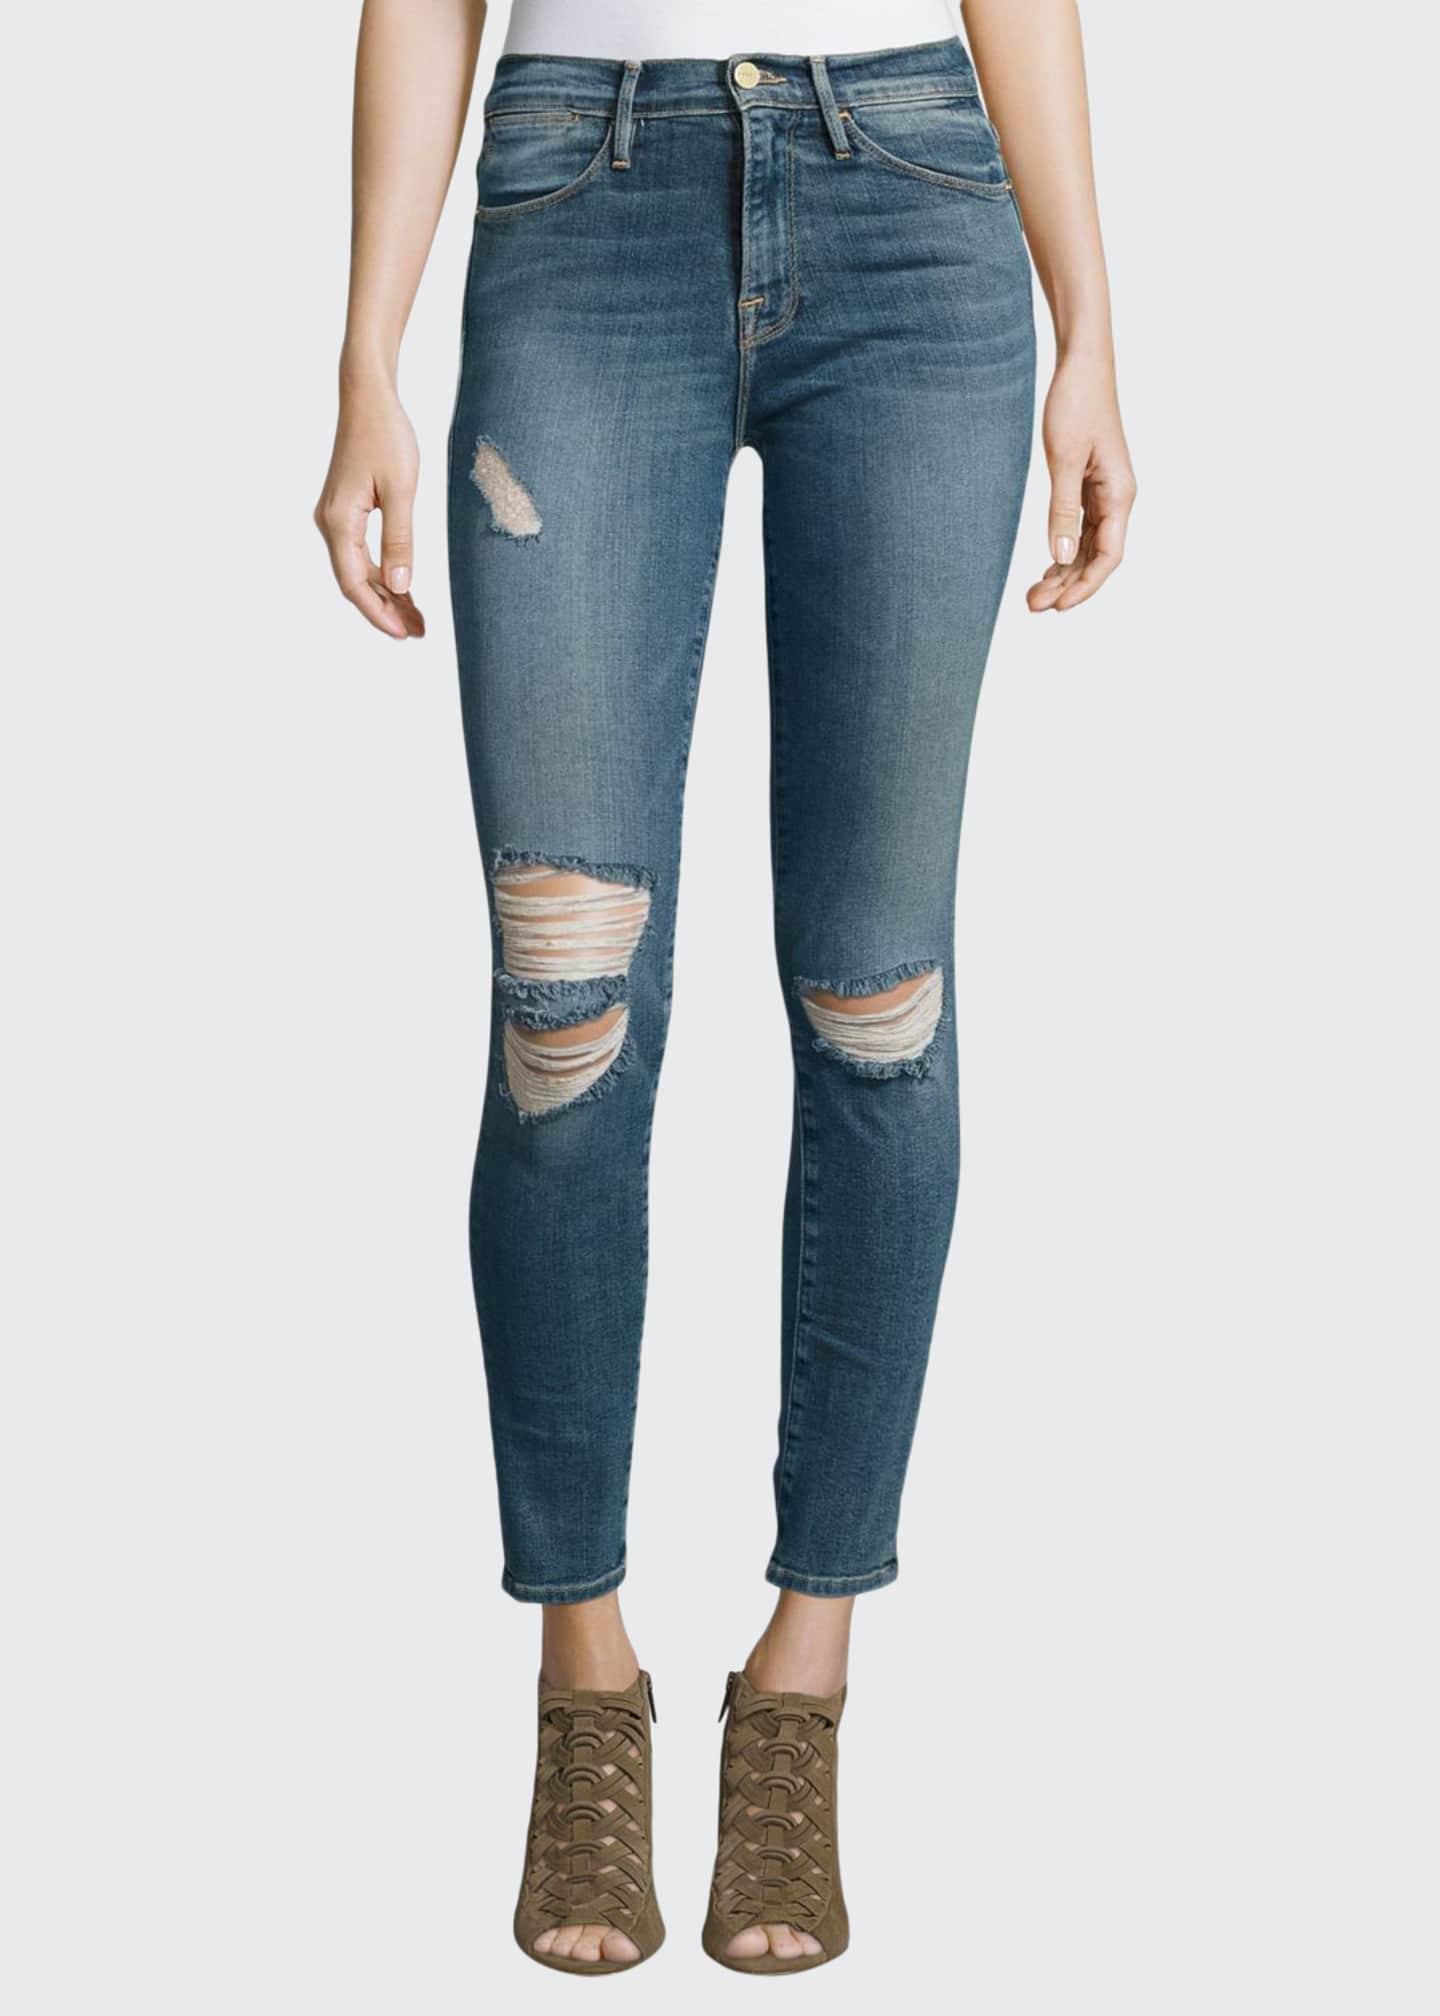 FRAME Le High Distressed Skinny Jeans, Harvard